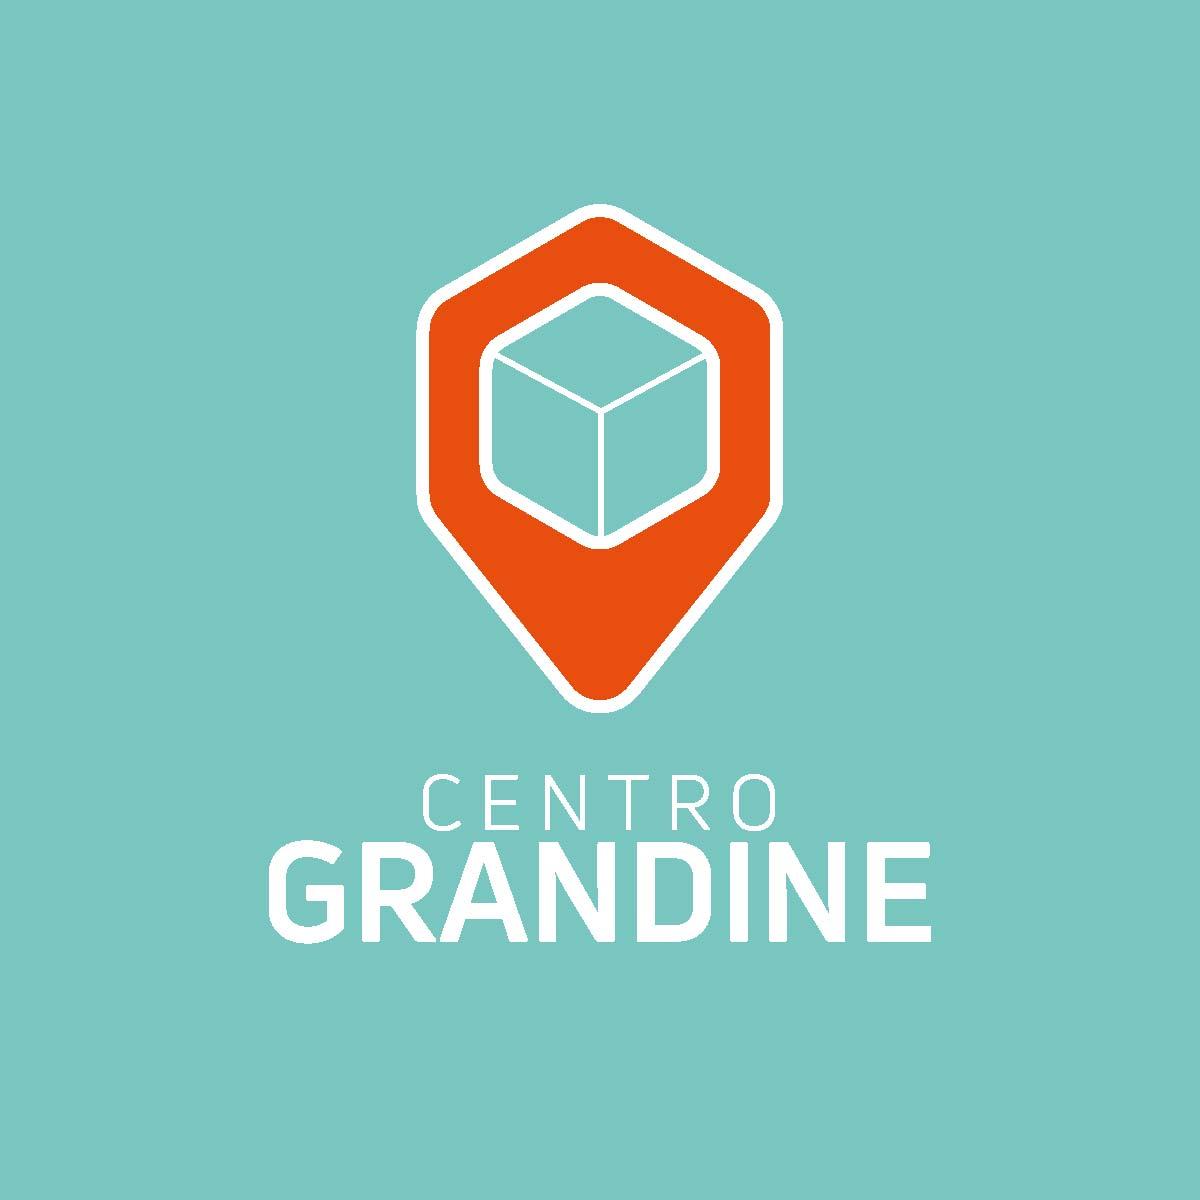 Centro Grandine